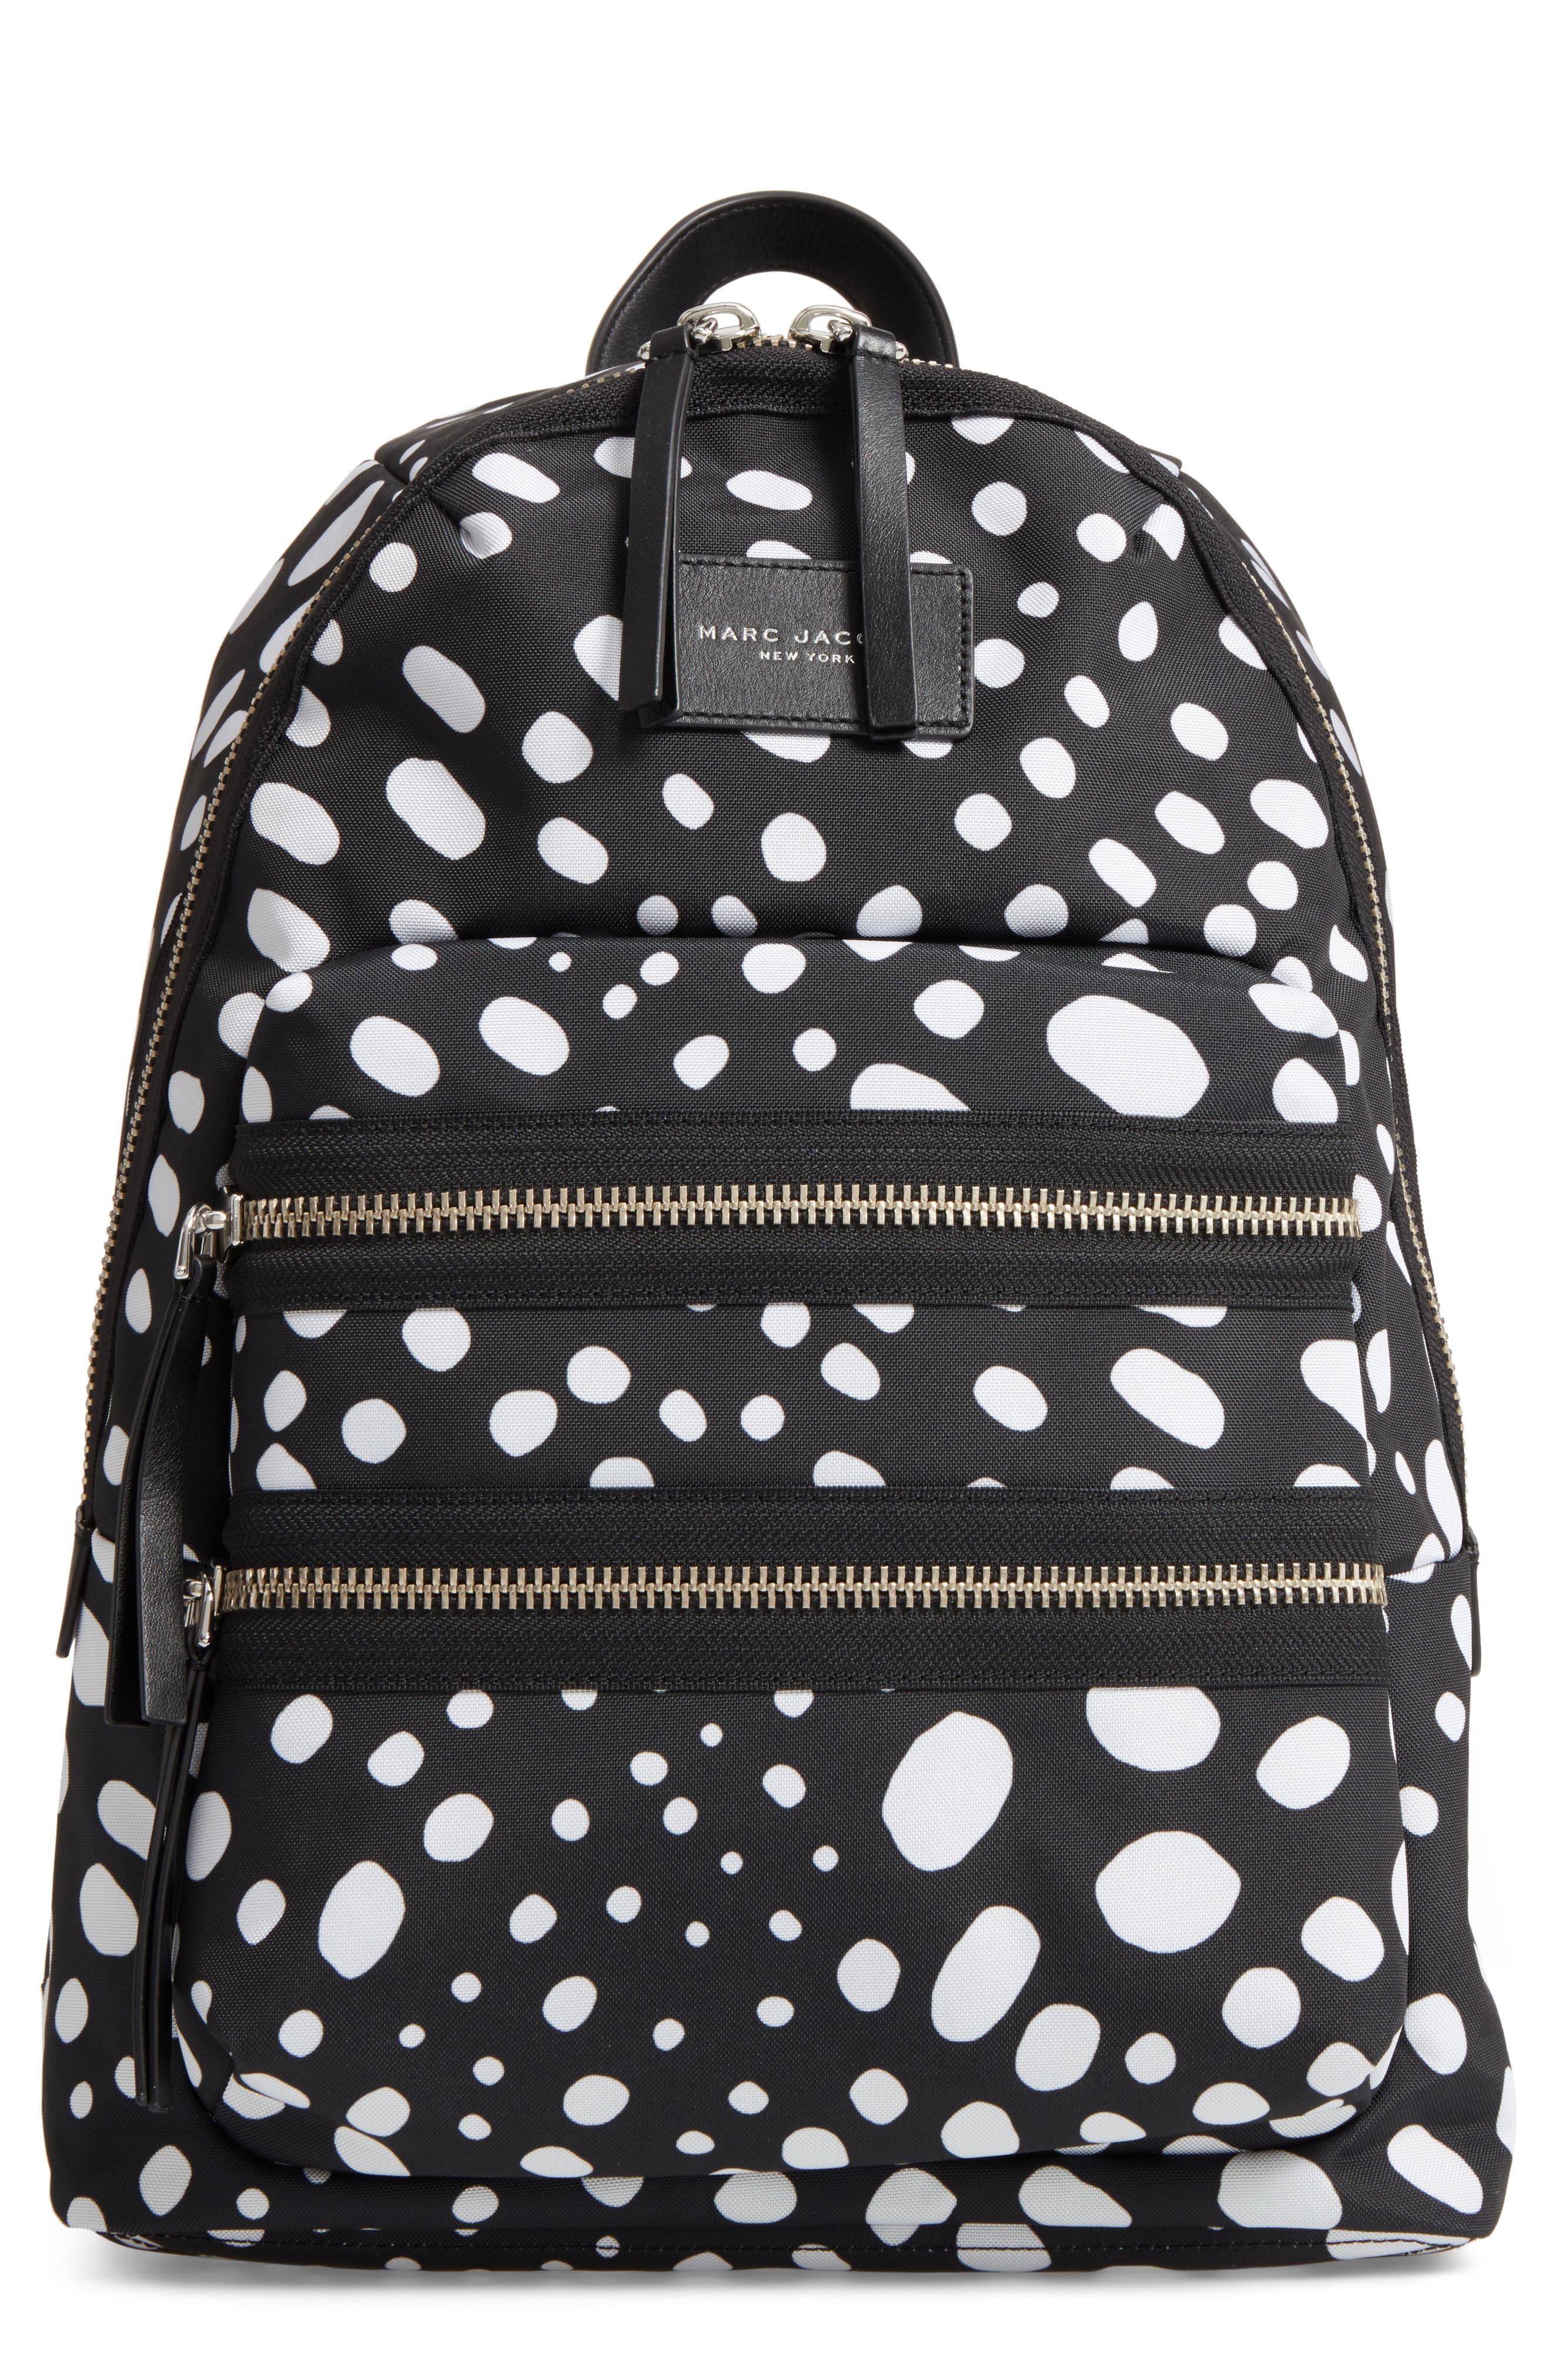 MARC JACOBS Biker - Wavy Spot Backpack